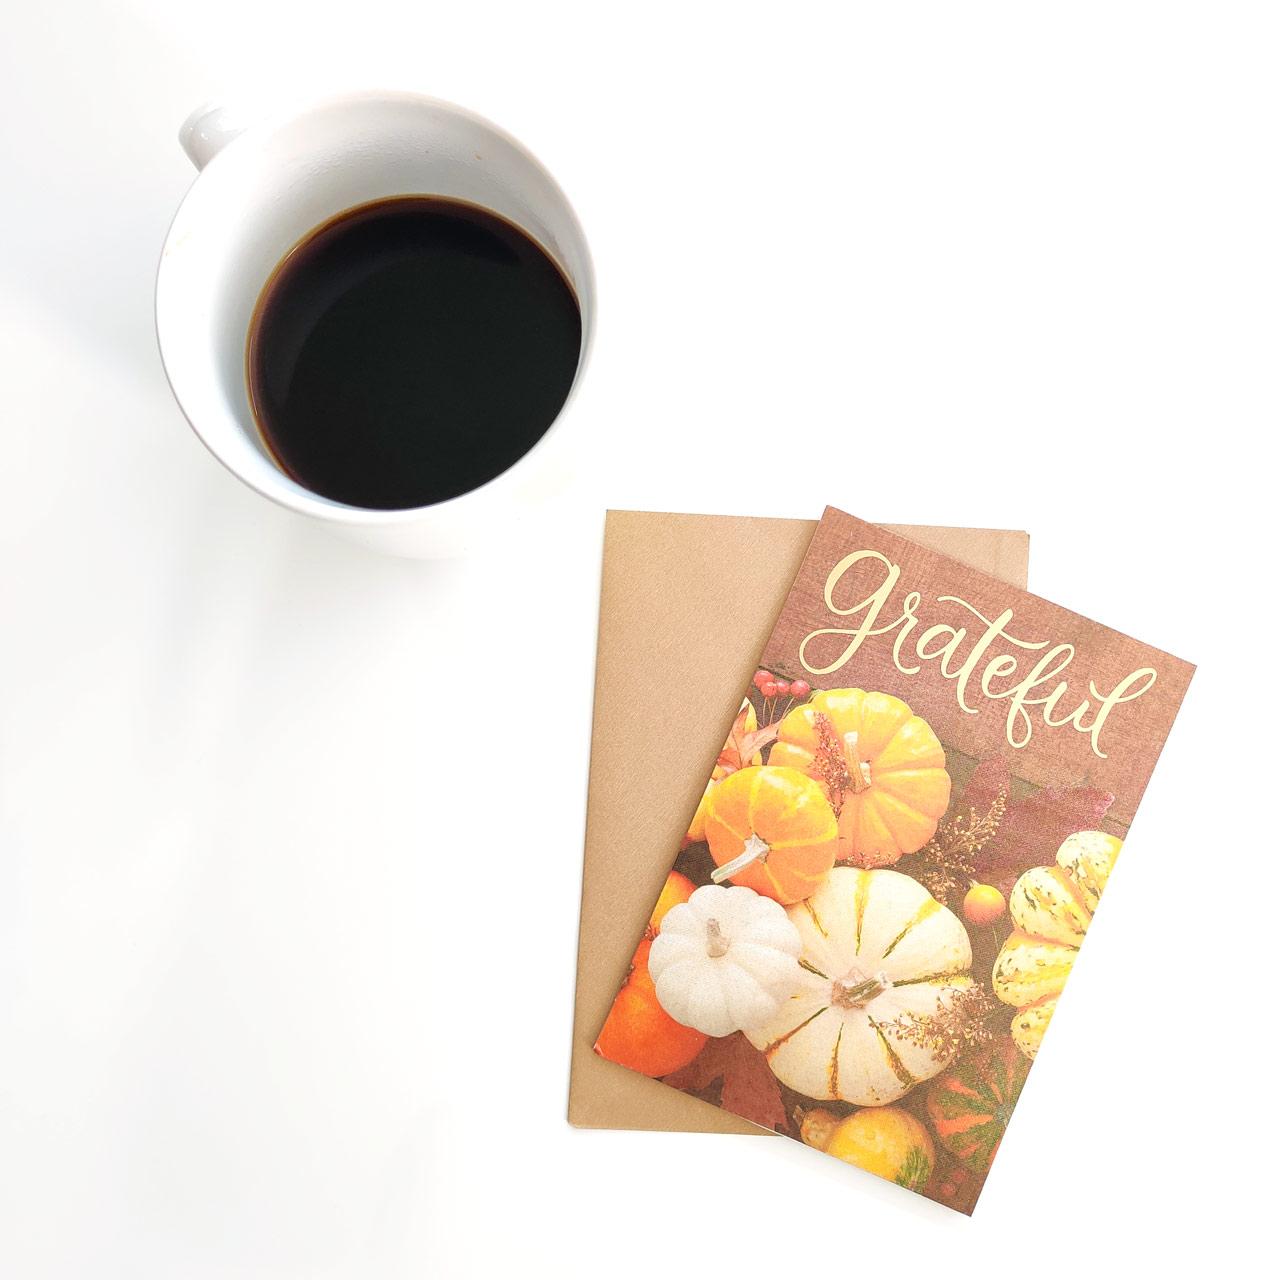 Mon-premier-thanksgiving-coffee-grateful-nelly-genisson